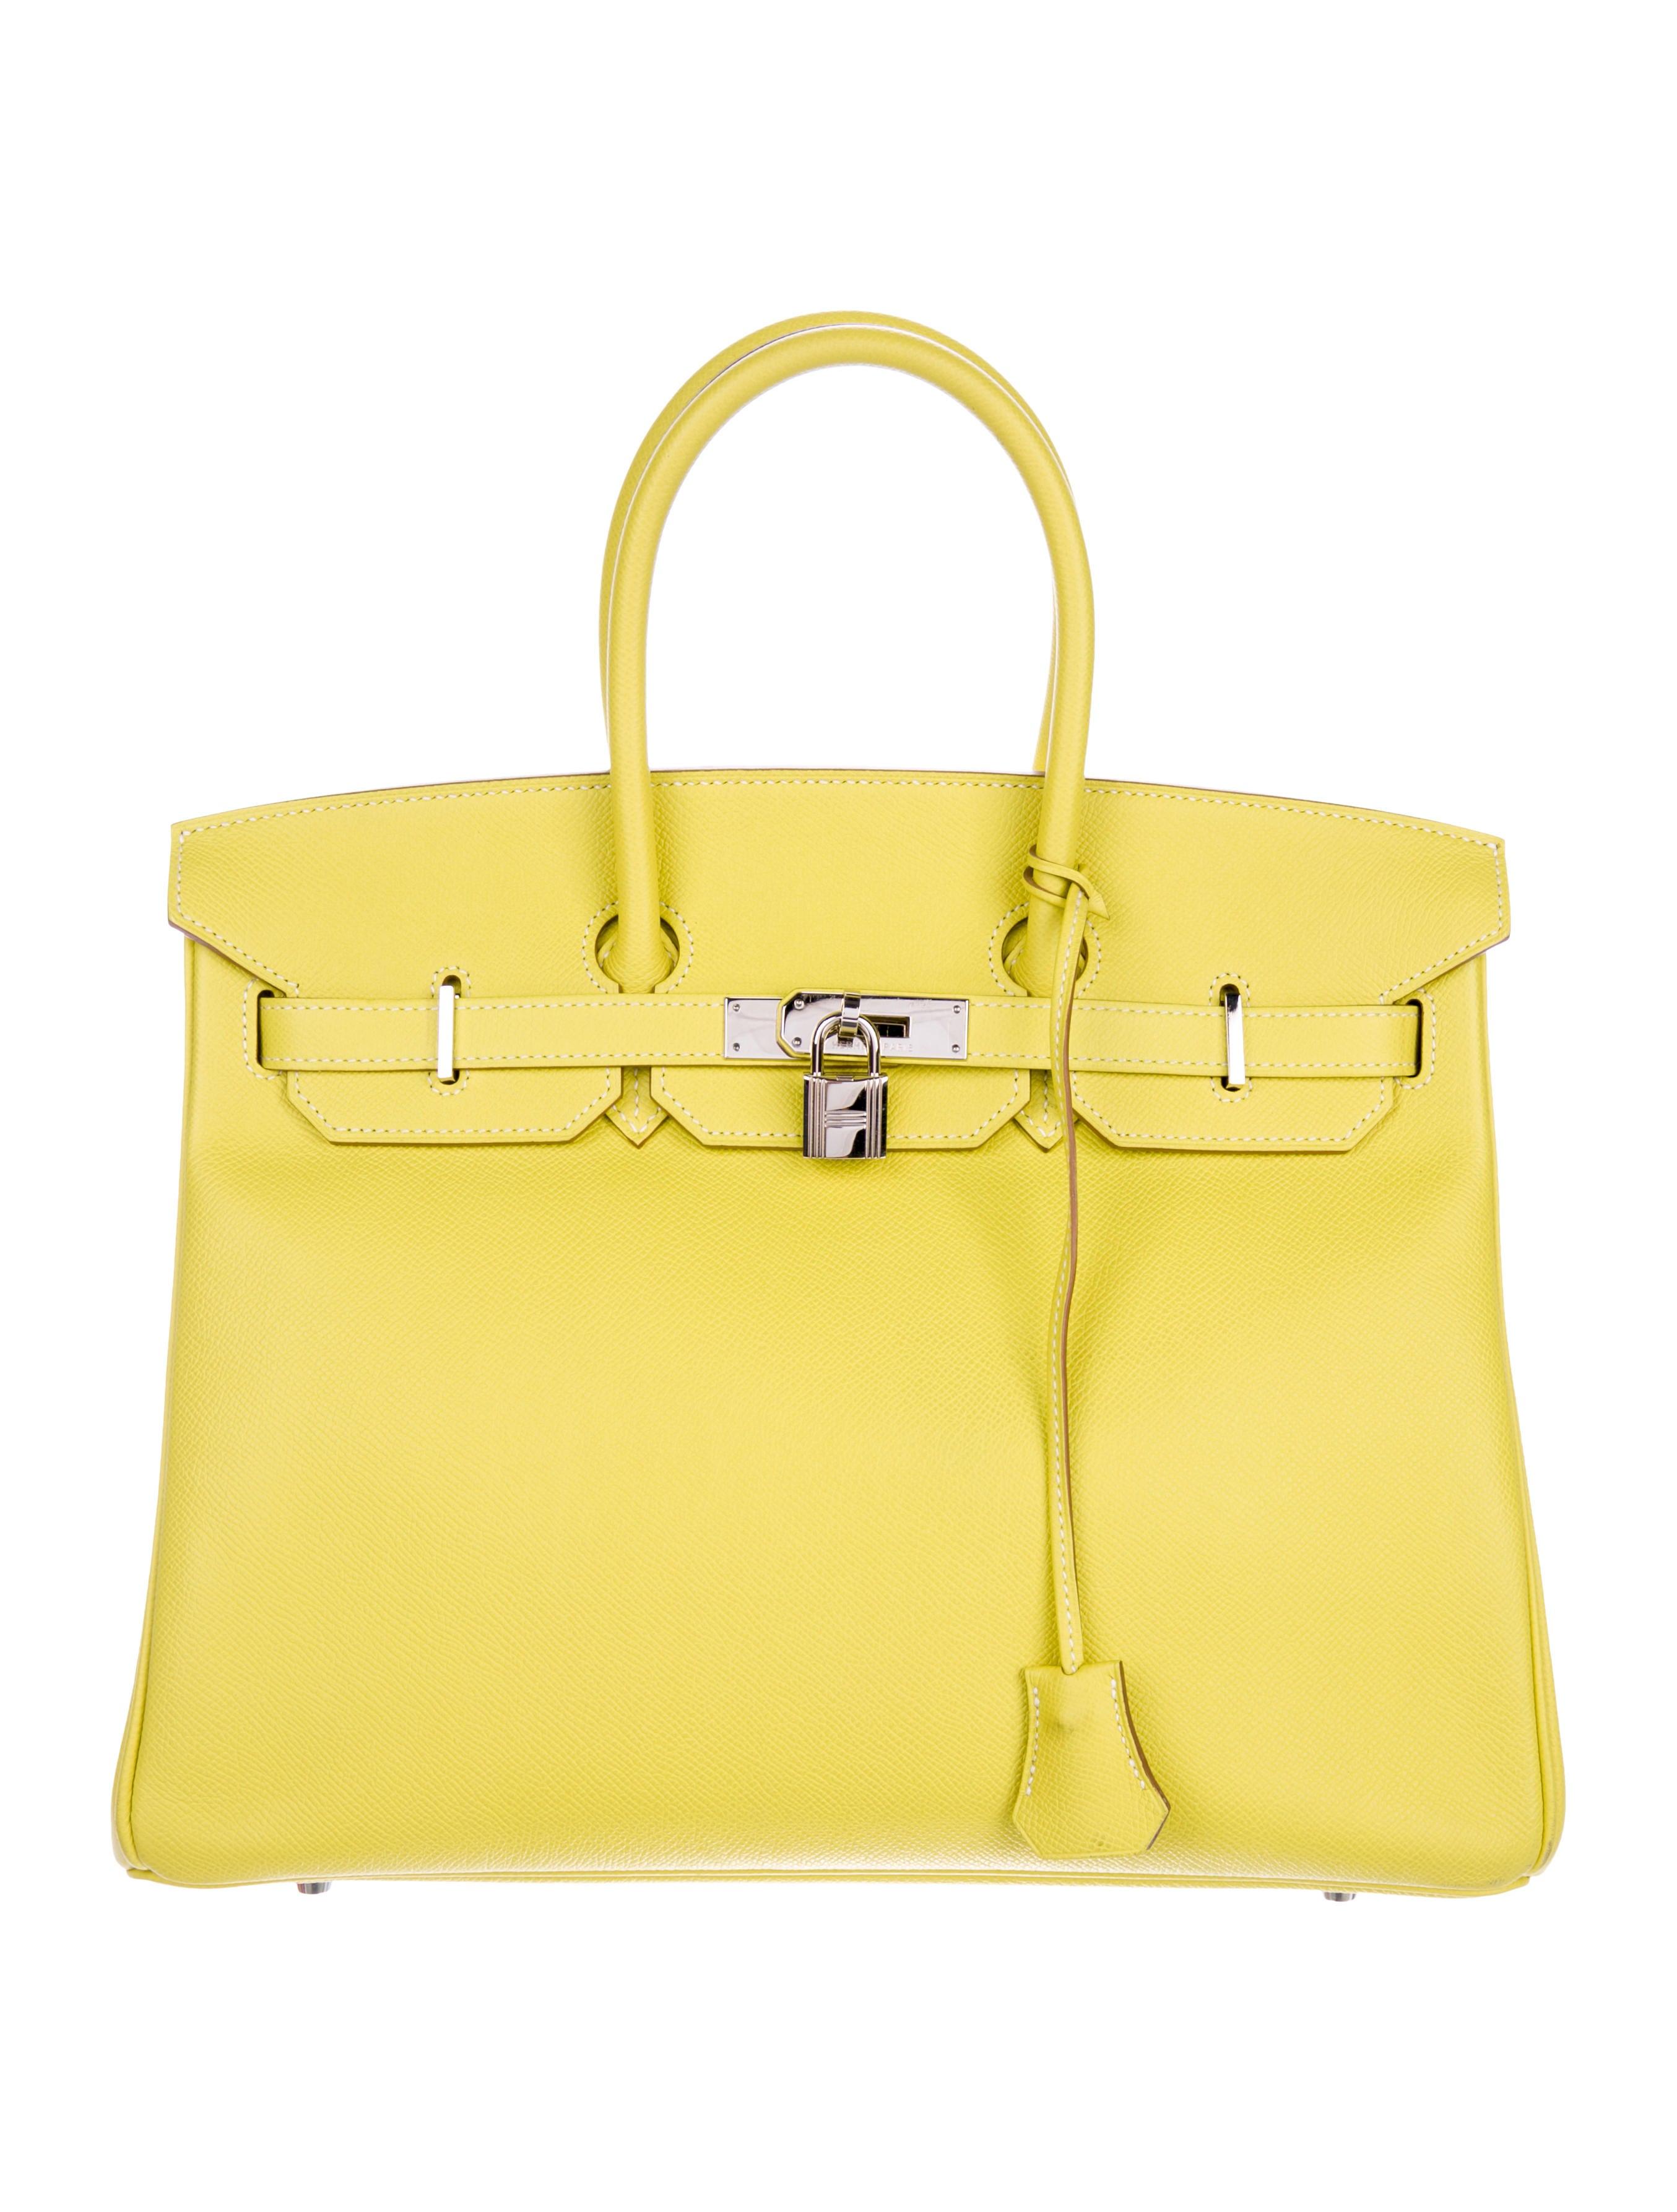 a91172959c Hermès Epsom Birkin 35 - Handbags - HER149340